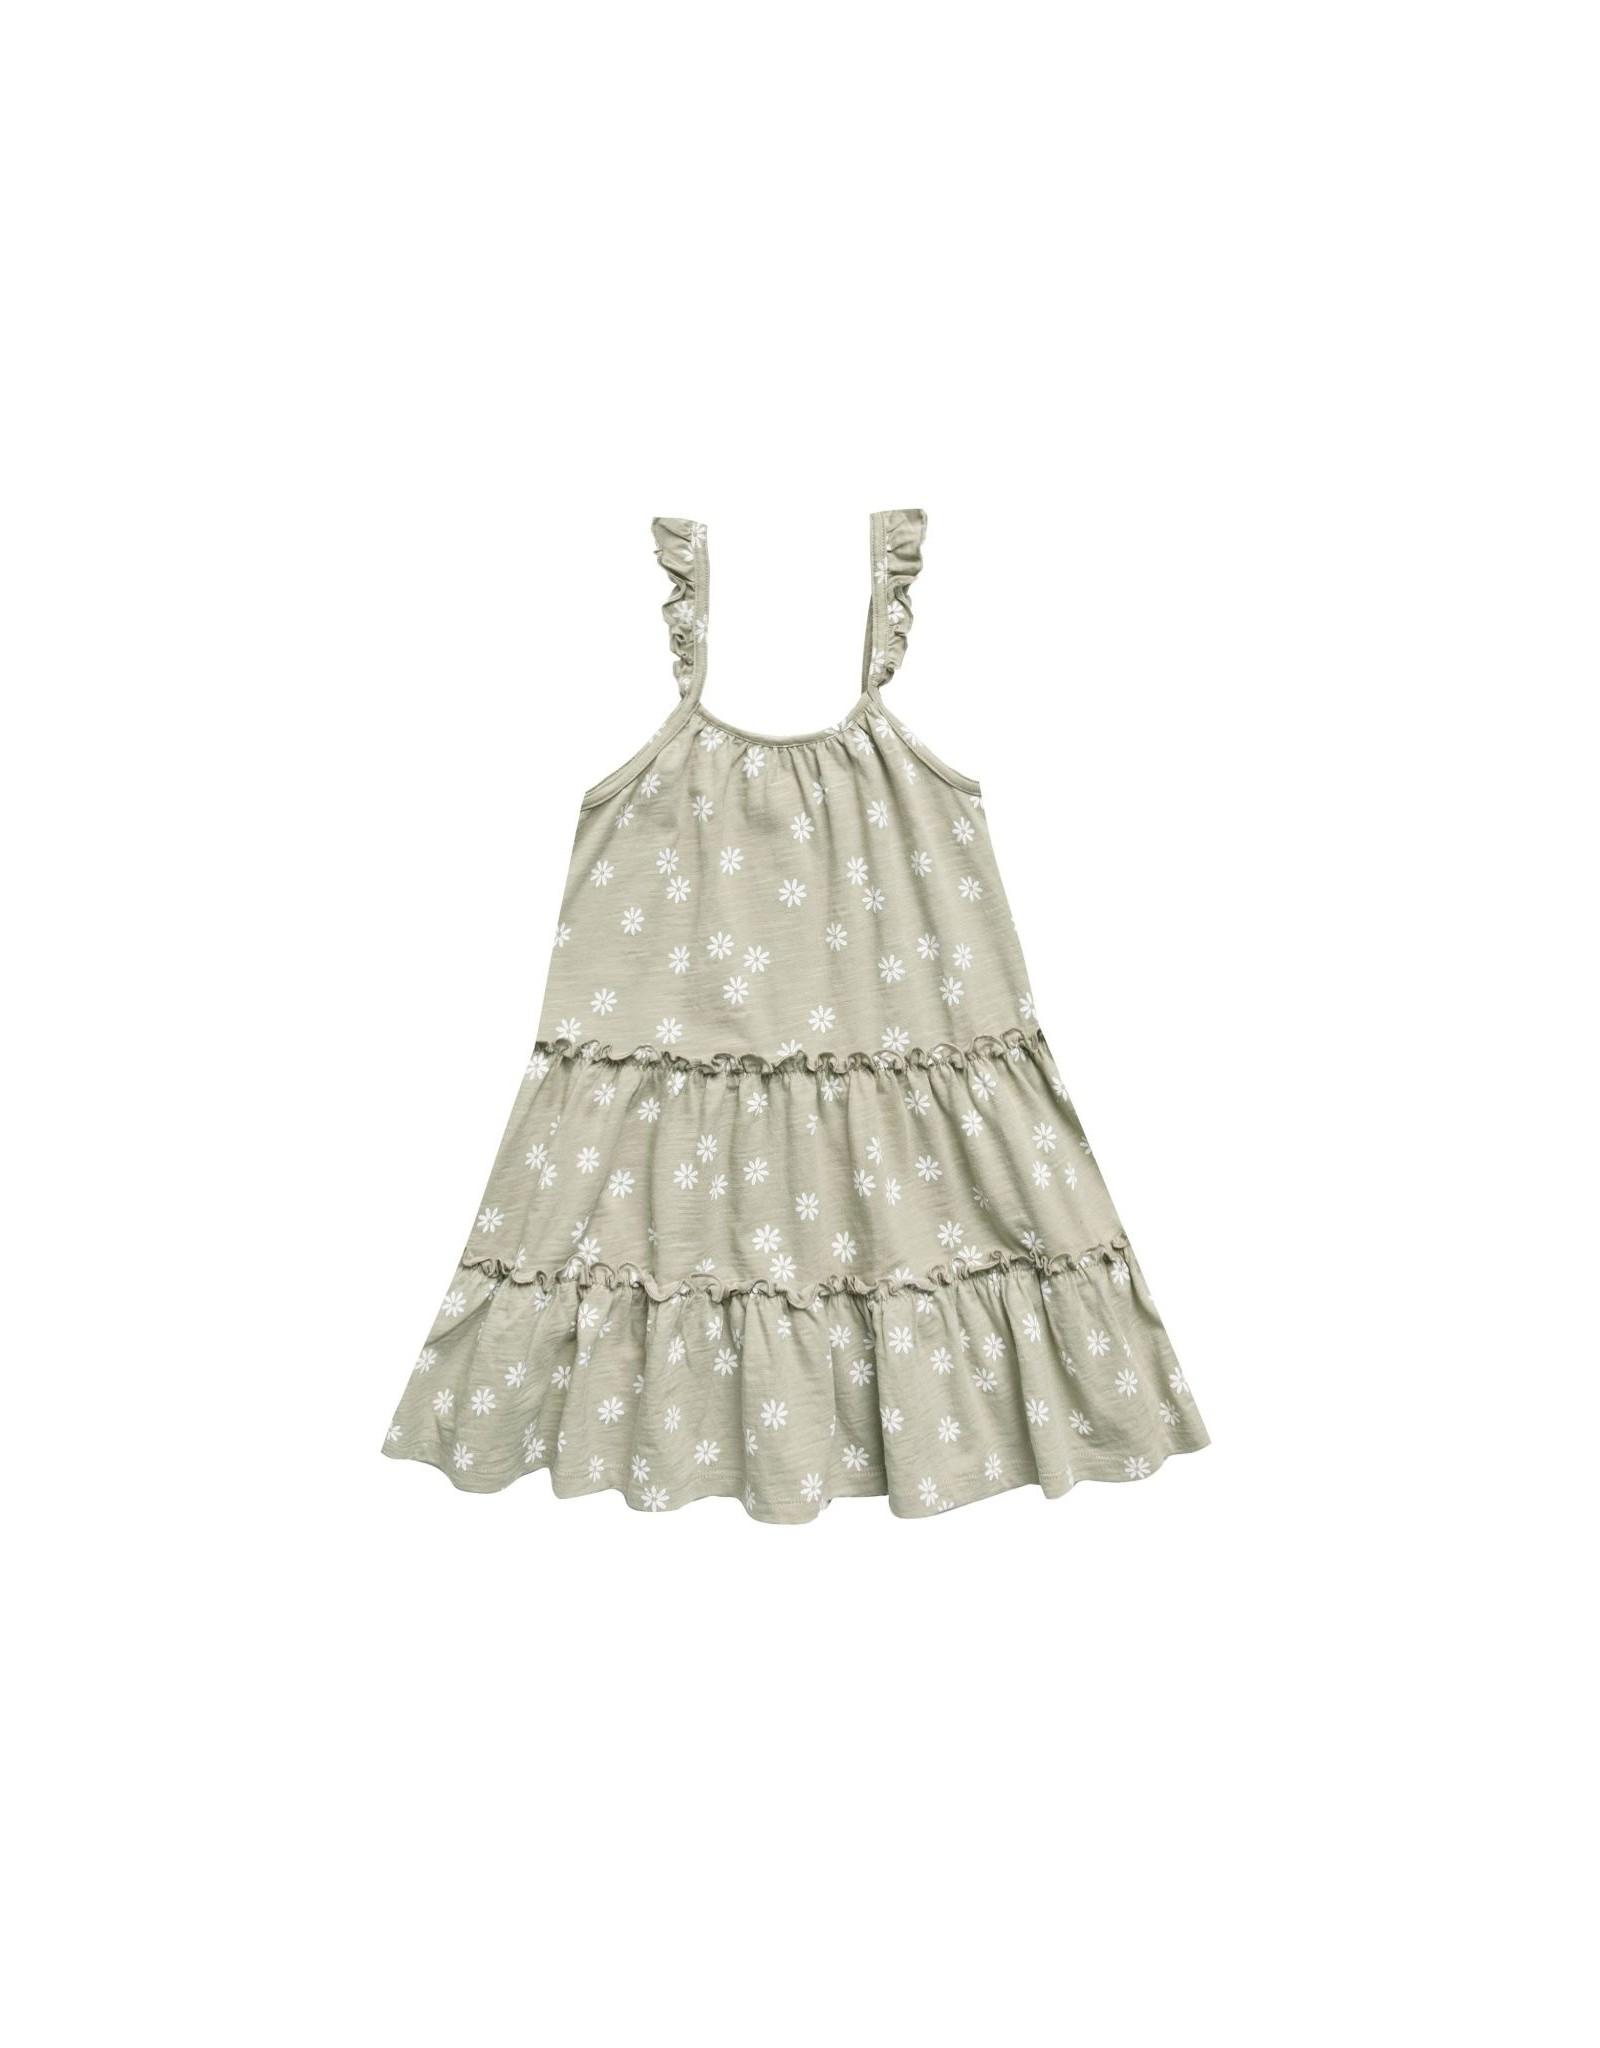 Rylee & Cru Rylee & Cru Daisy Confetti Tiered Jersey Dress